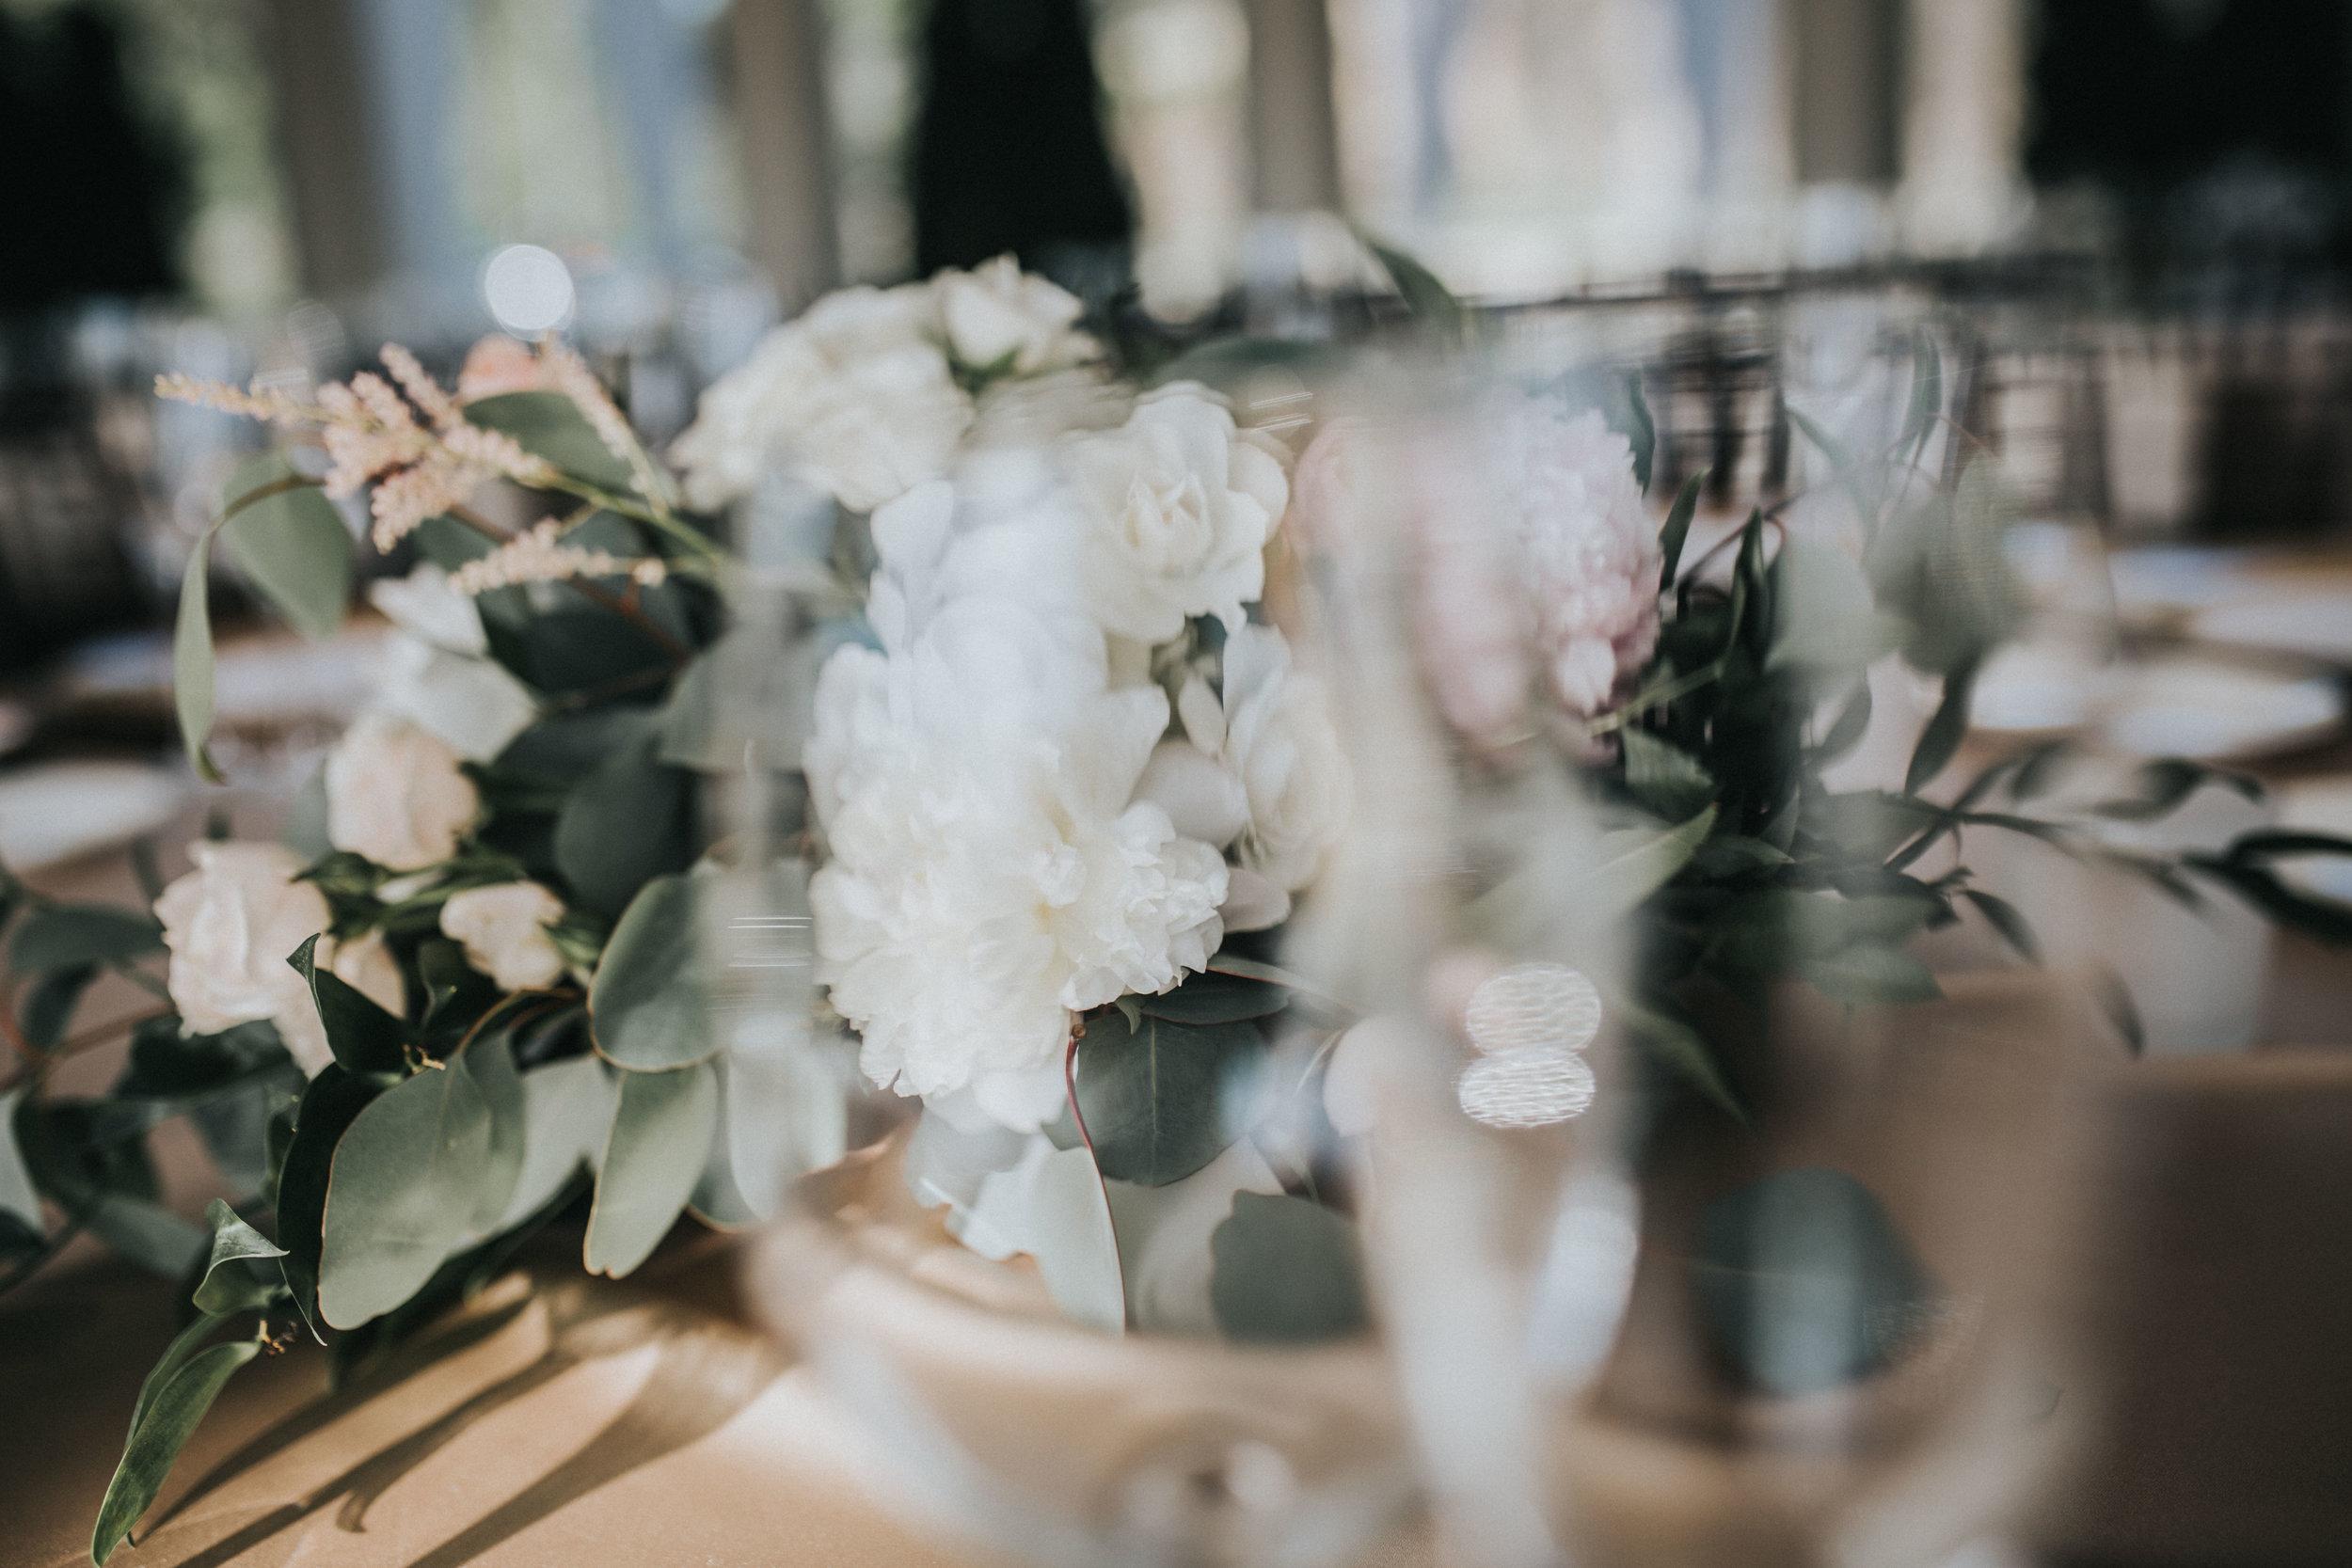 NewJersey_Wedding_Photography_Philadelphia__cescaphe_Waterworks_VenueDetails-6.jpg